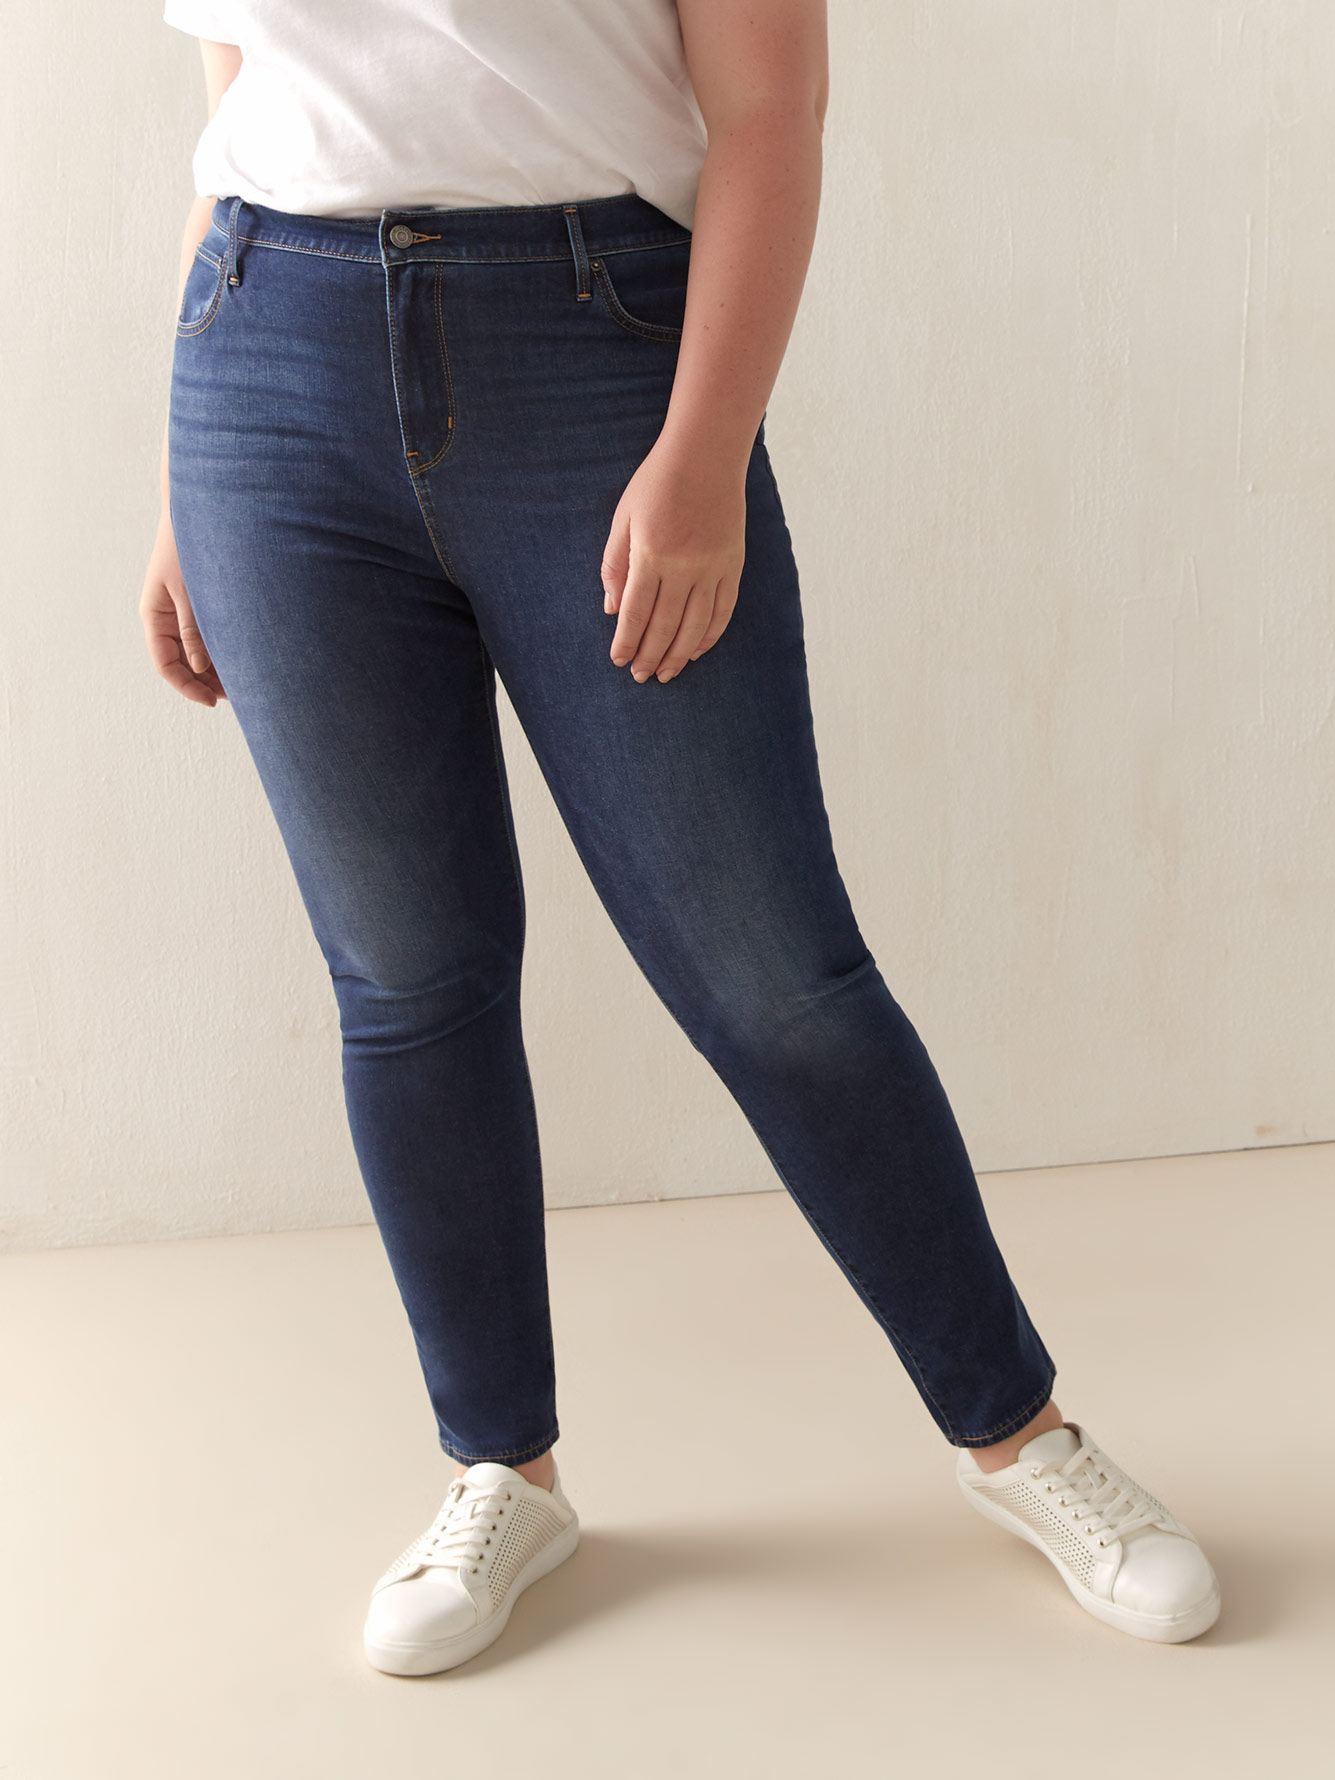 High-Rise 721 Skinny Jean - Levi's Premium